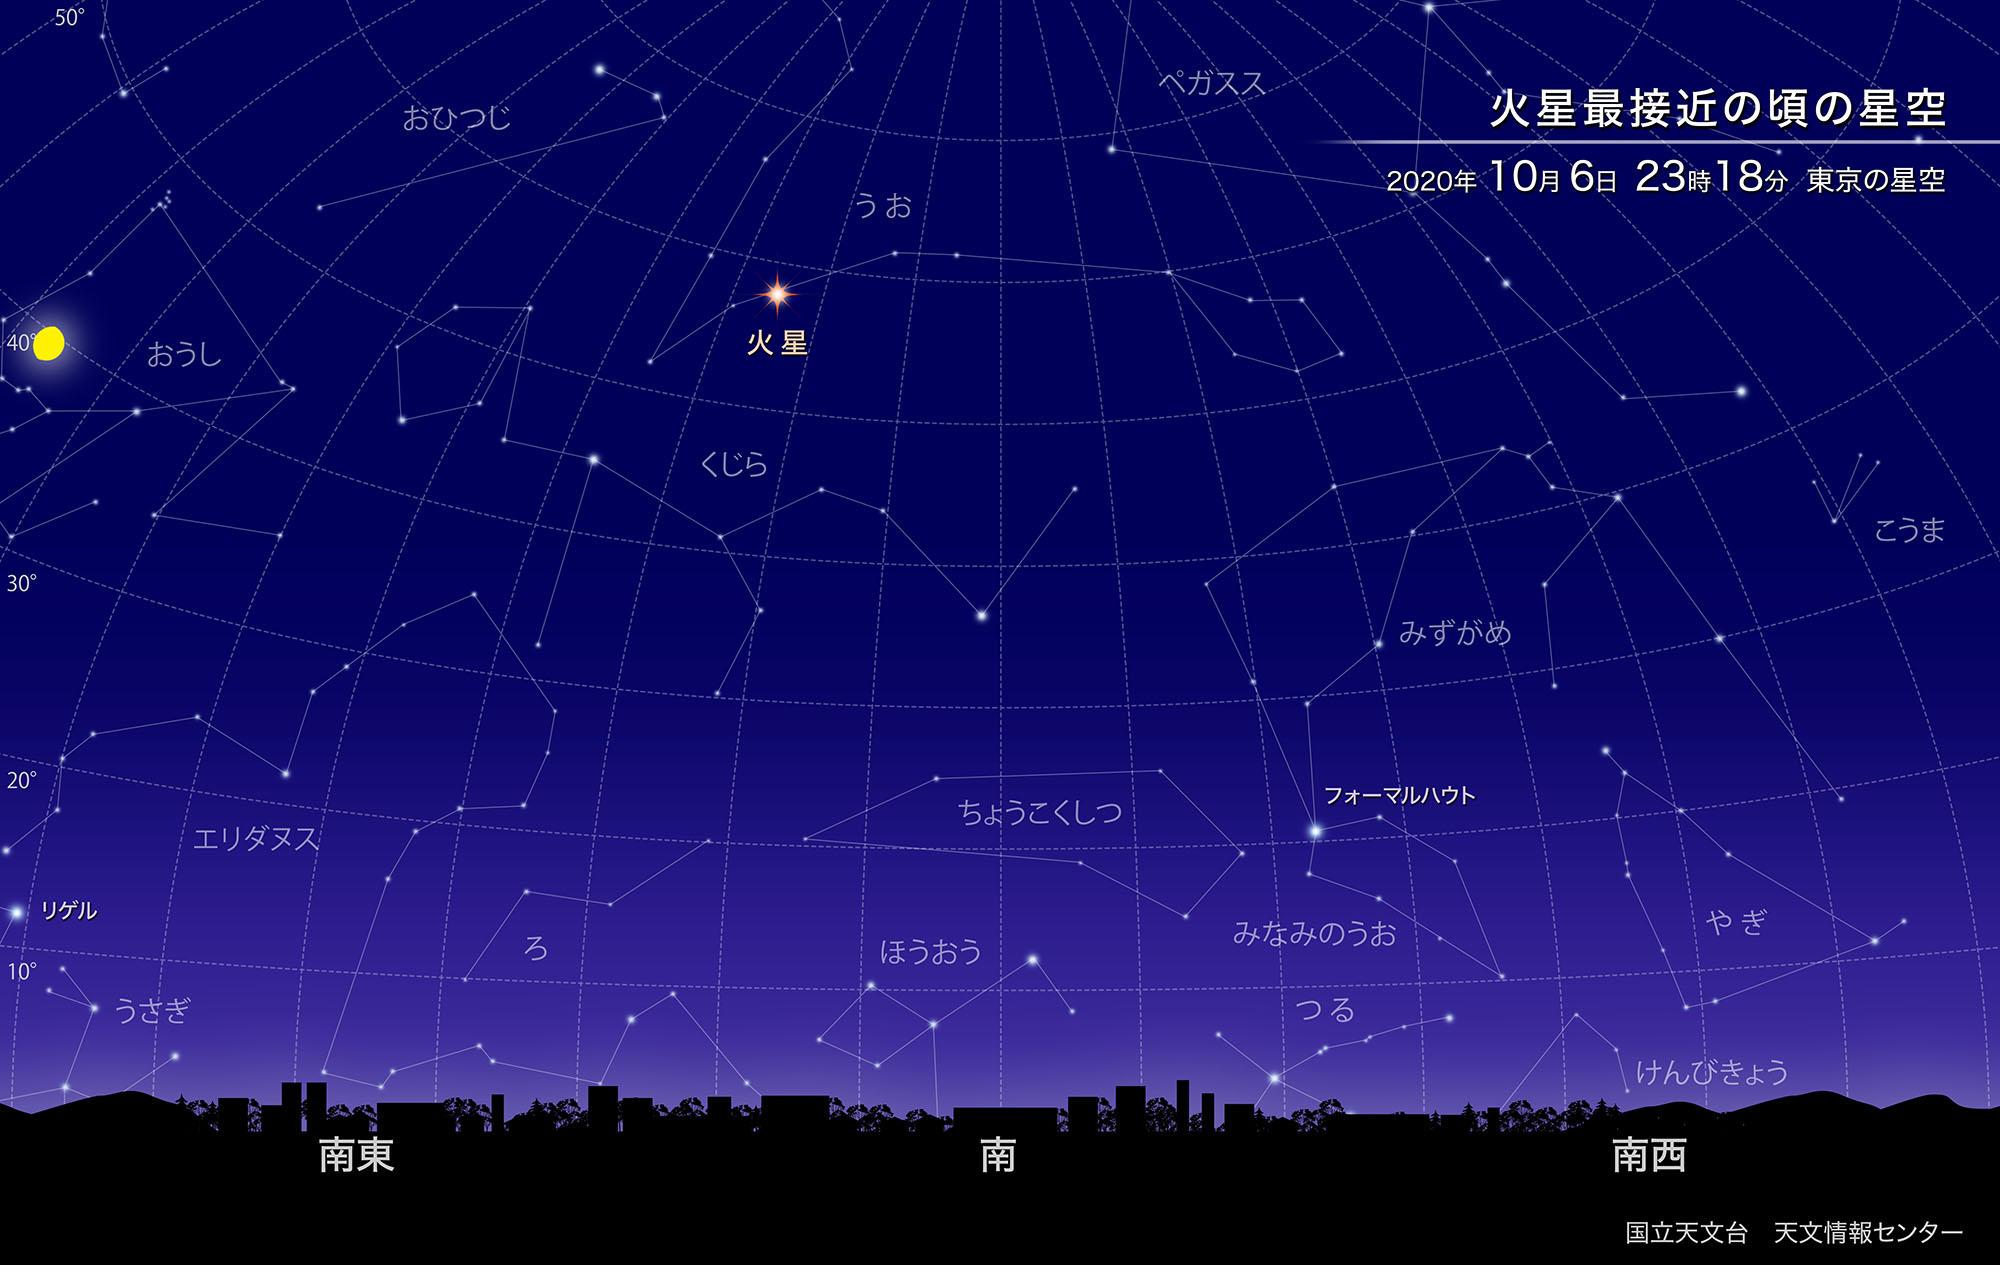 火星が地球に最接近(2020年10月) | 国立天文台(NAOJ)